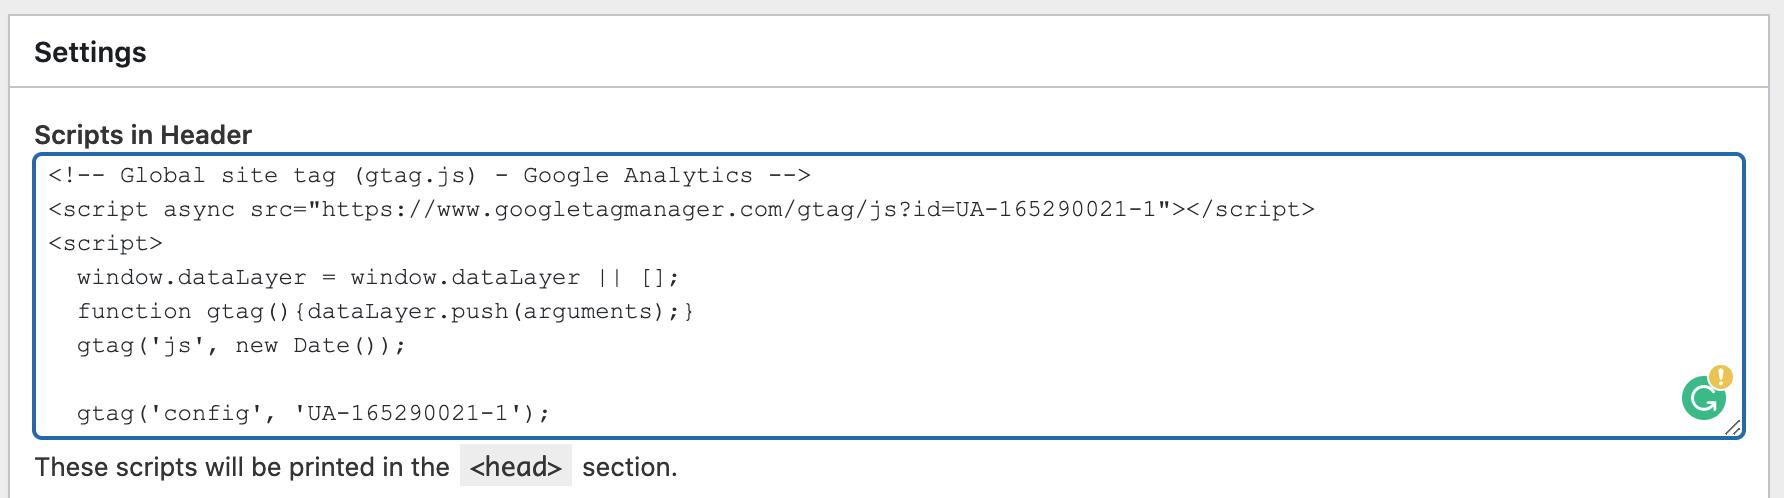 WordPress Google Analytics Kodu Ekleme